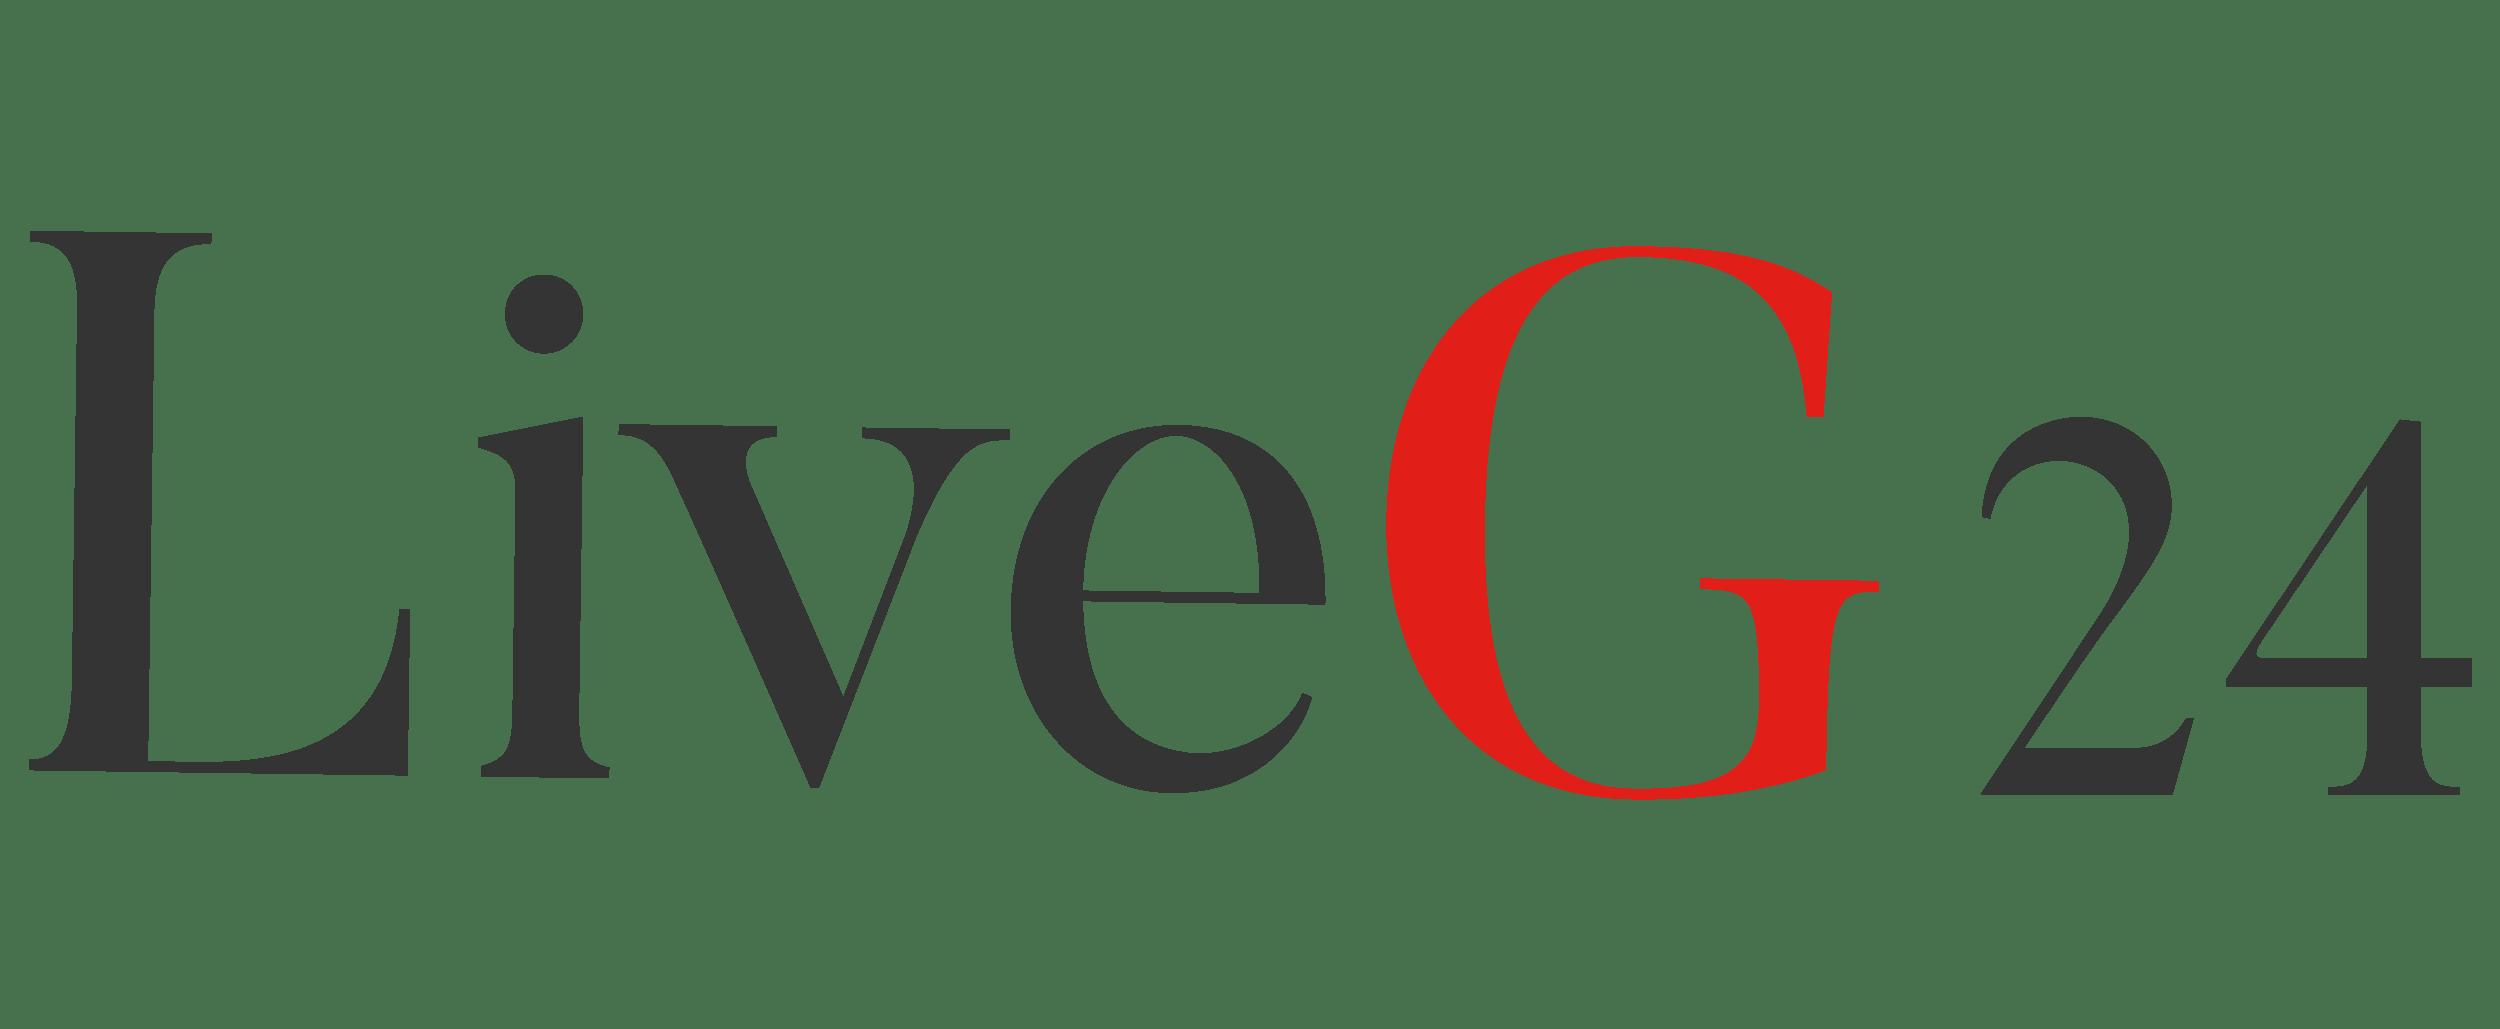 LiveG24 (formerly Medialive Casino) giochi